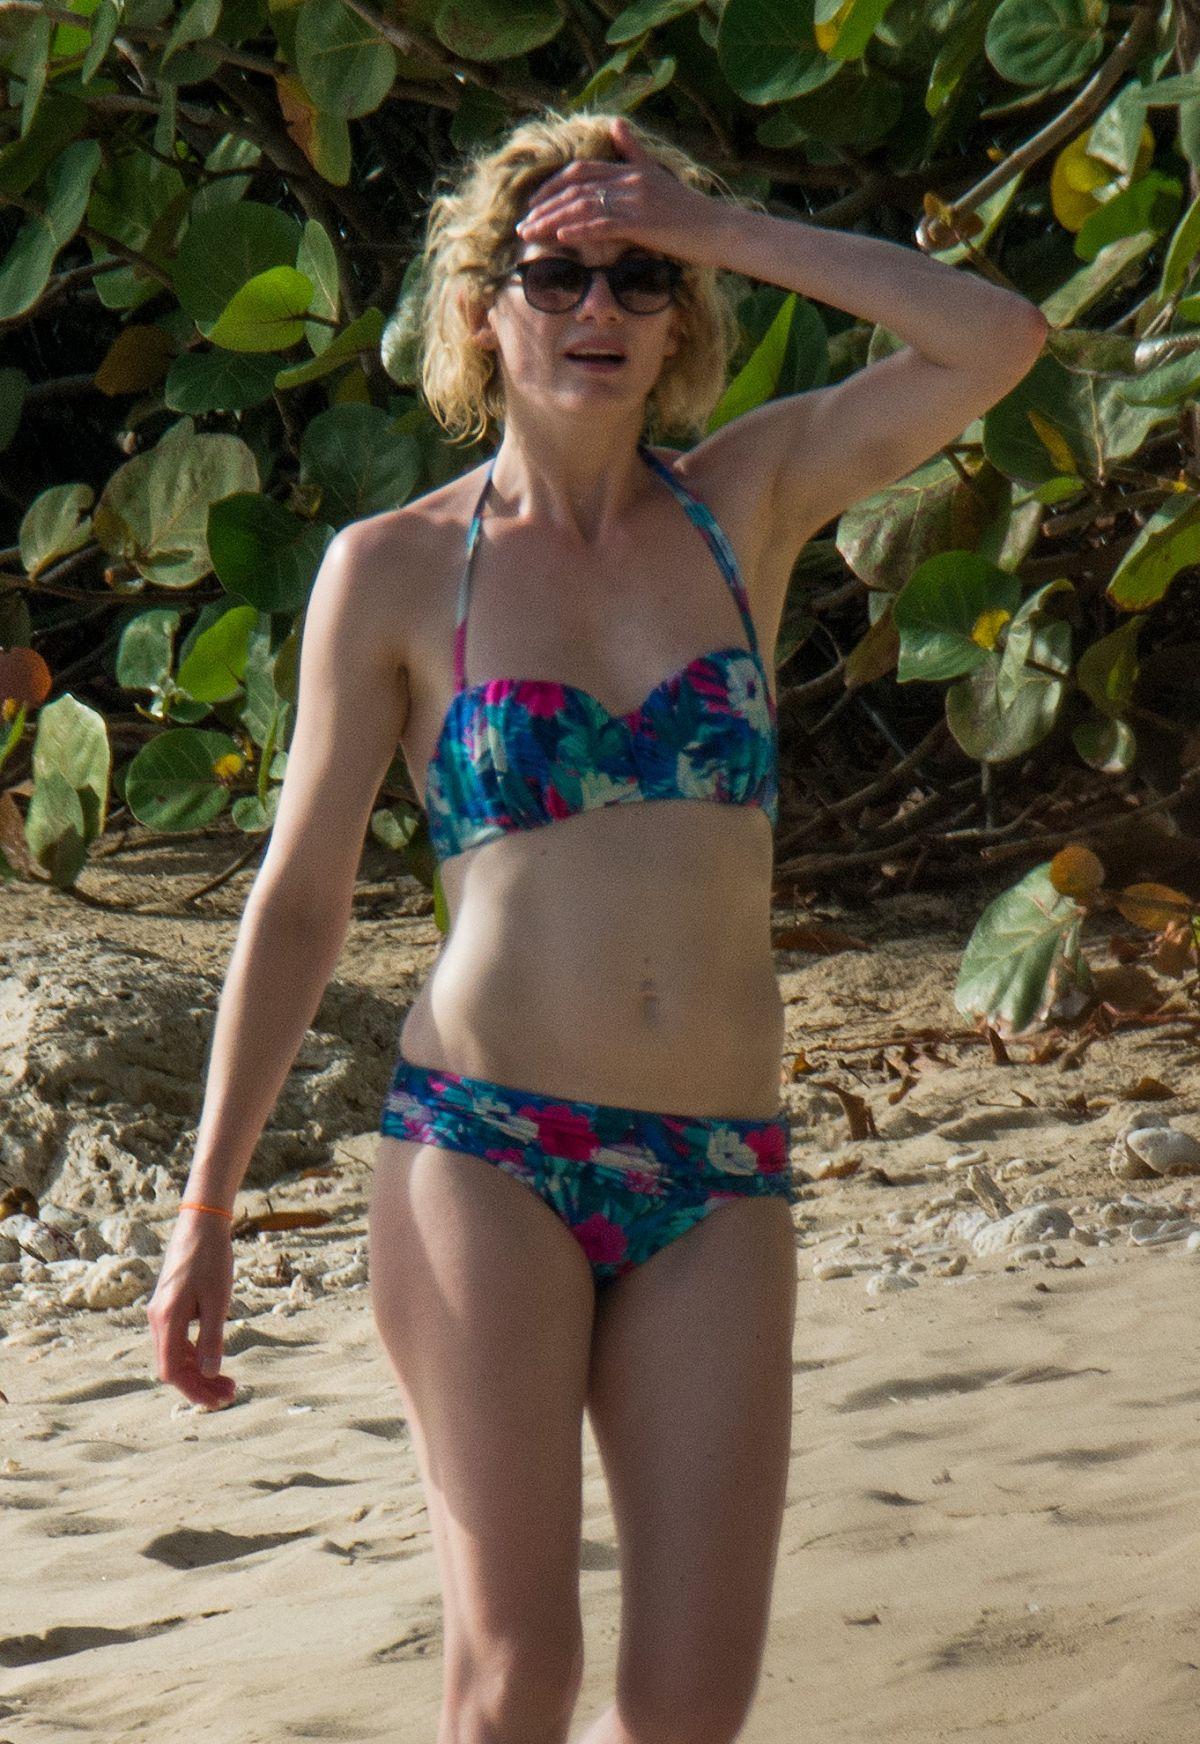 Bikini Jodie Whittaker nude photos 2019